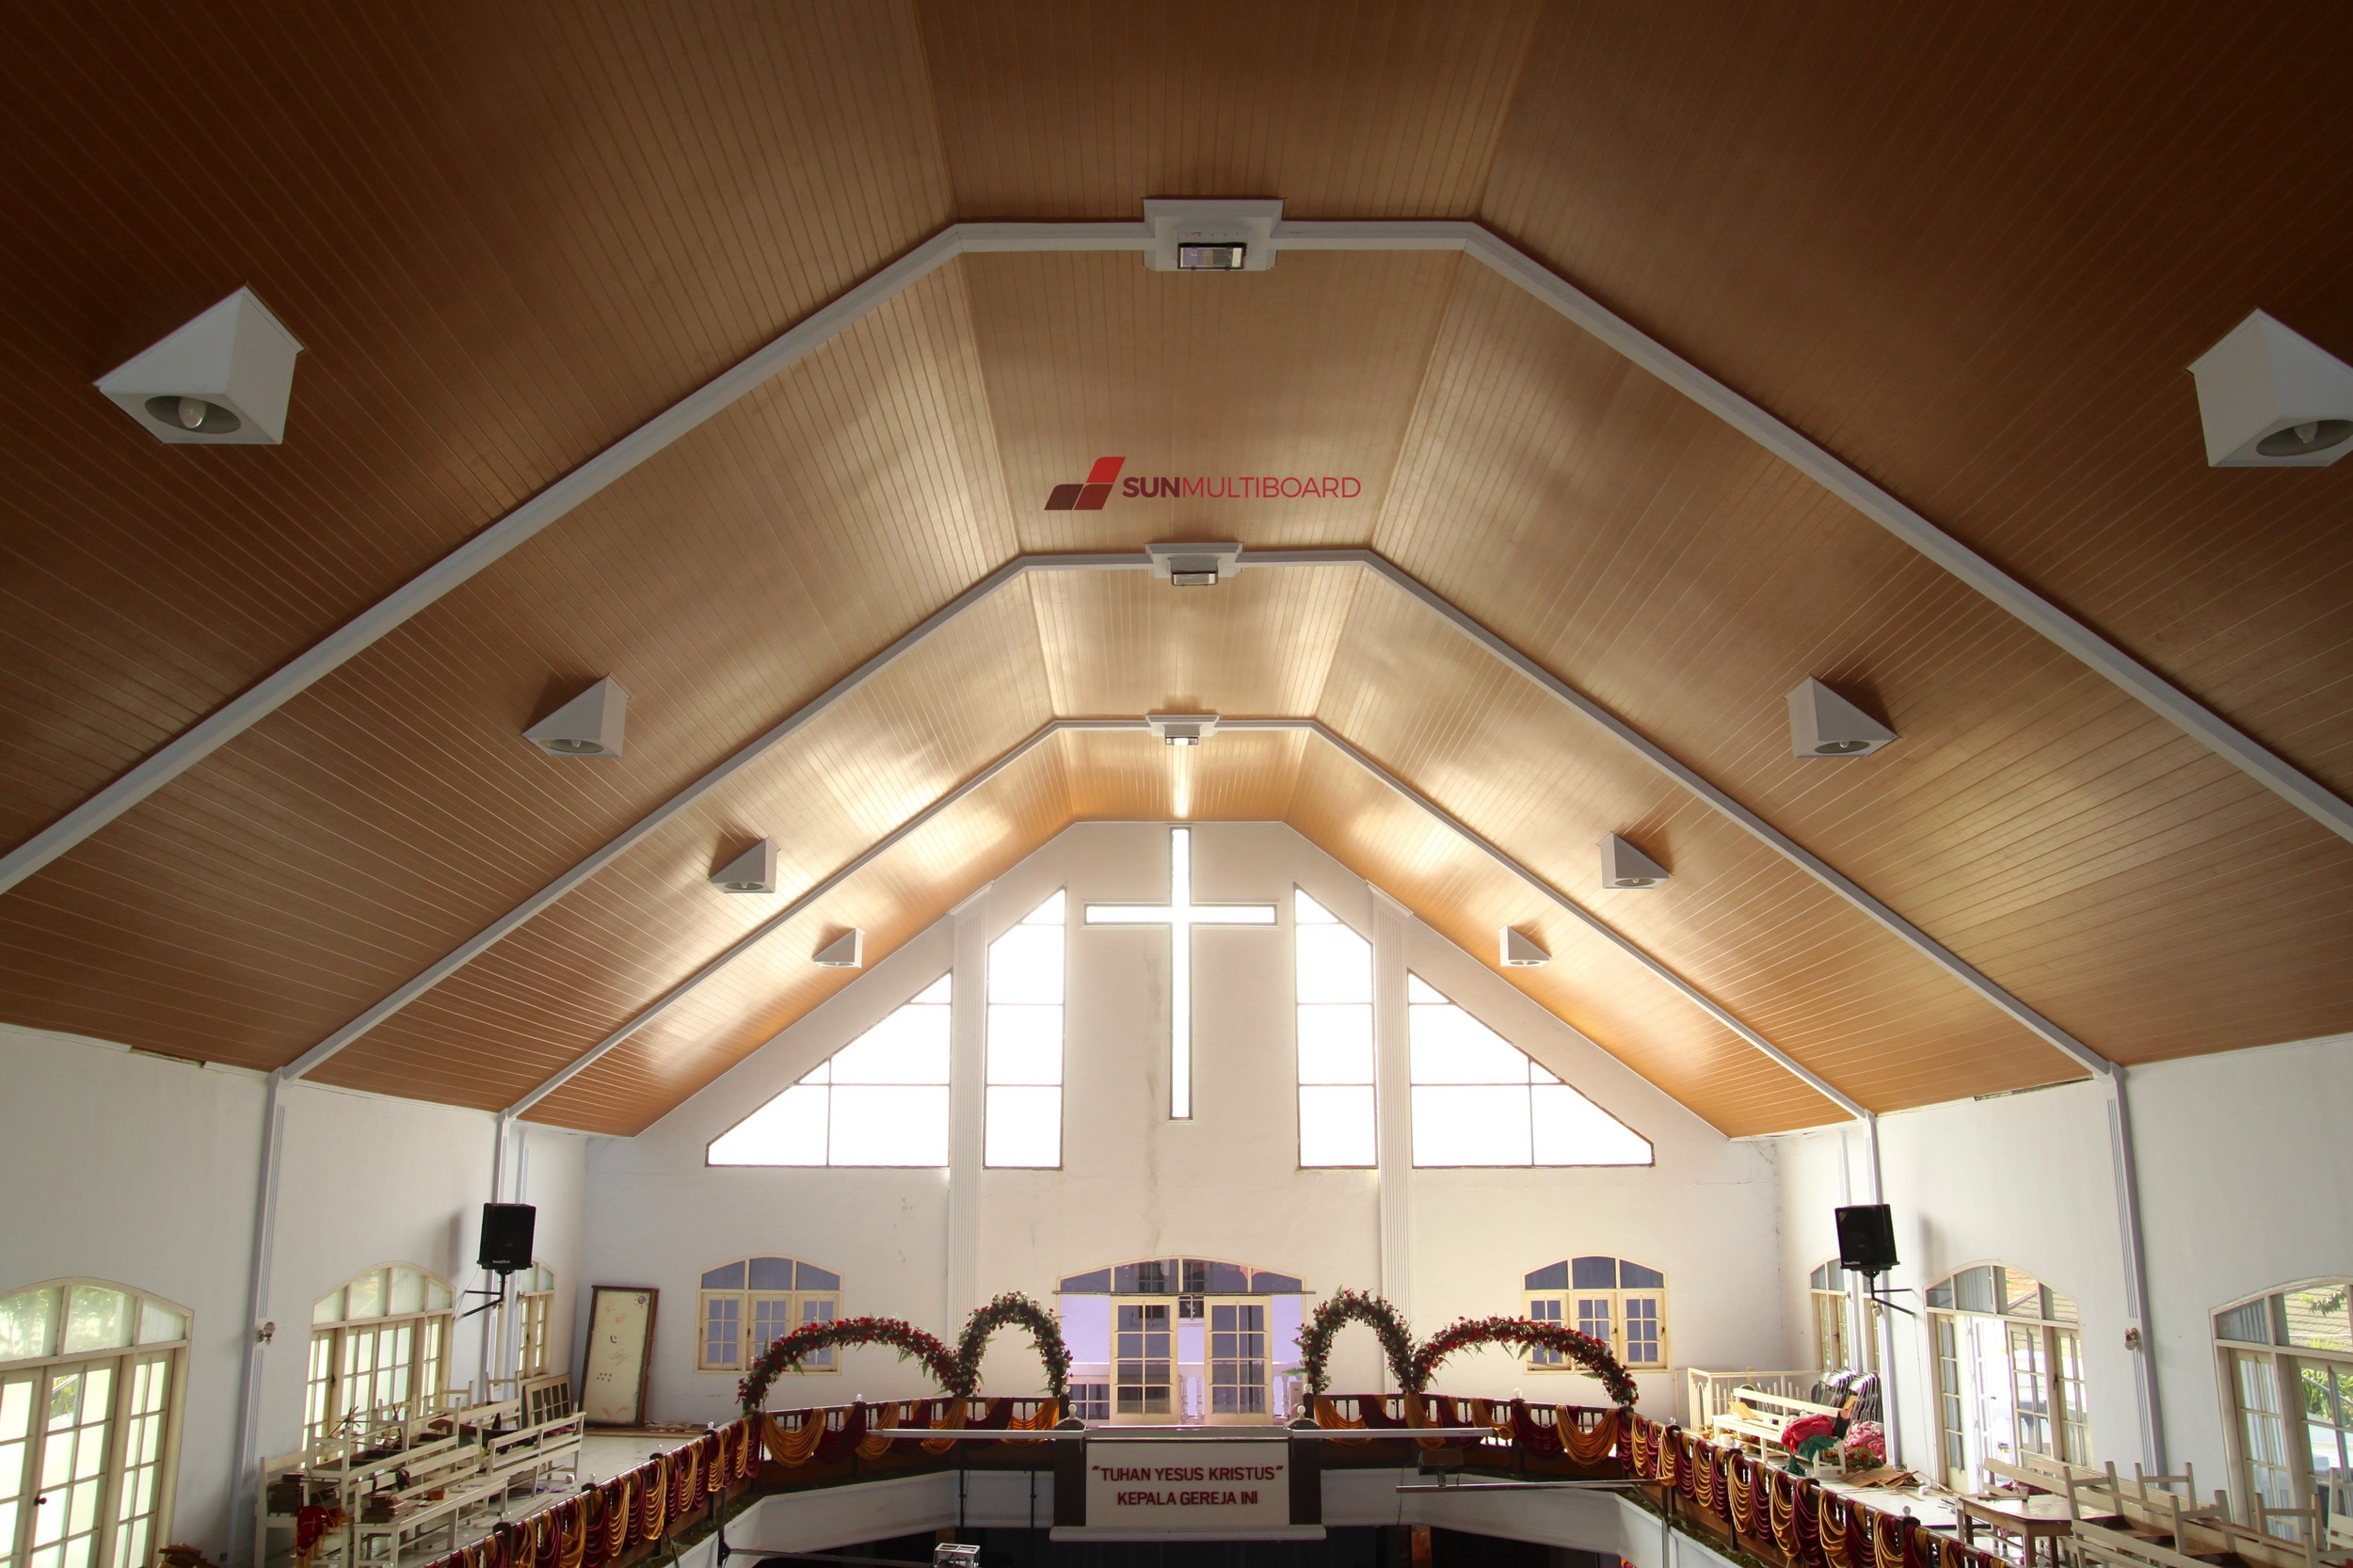 Contoh Gambar Plafon Gereja  desain plafon masjid rumah joglo limasan work